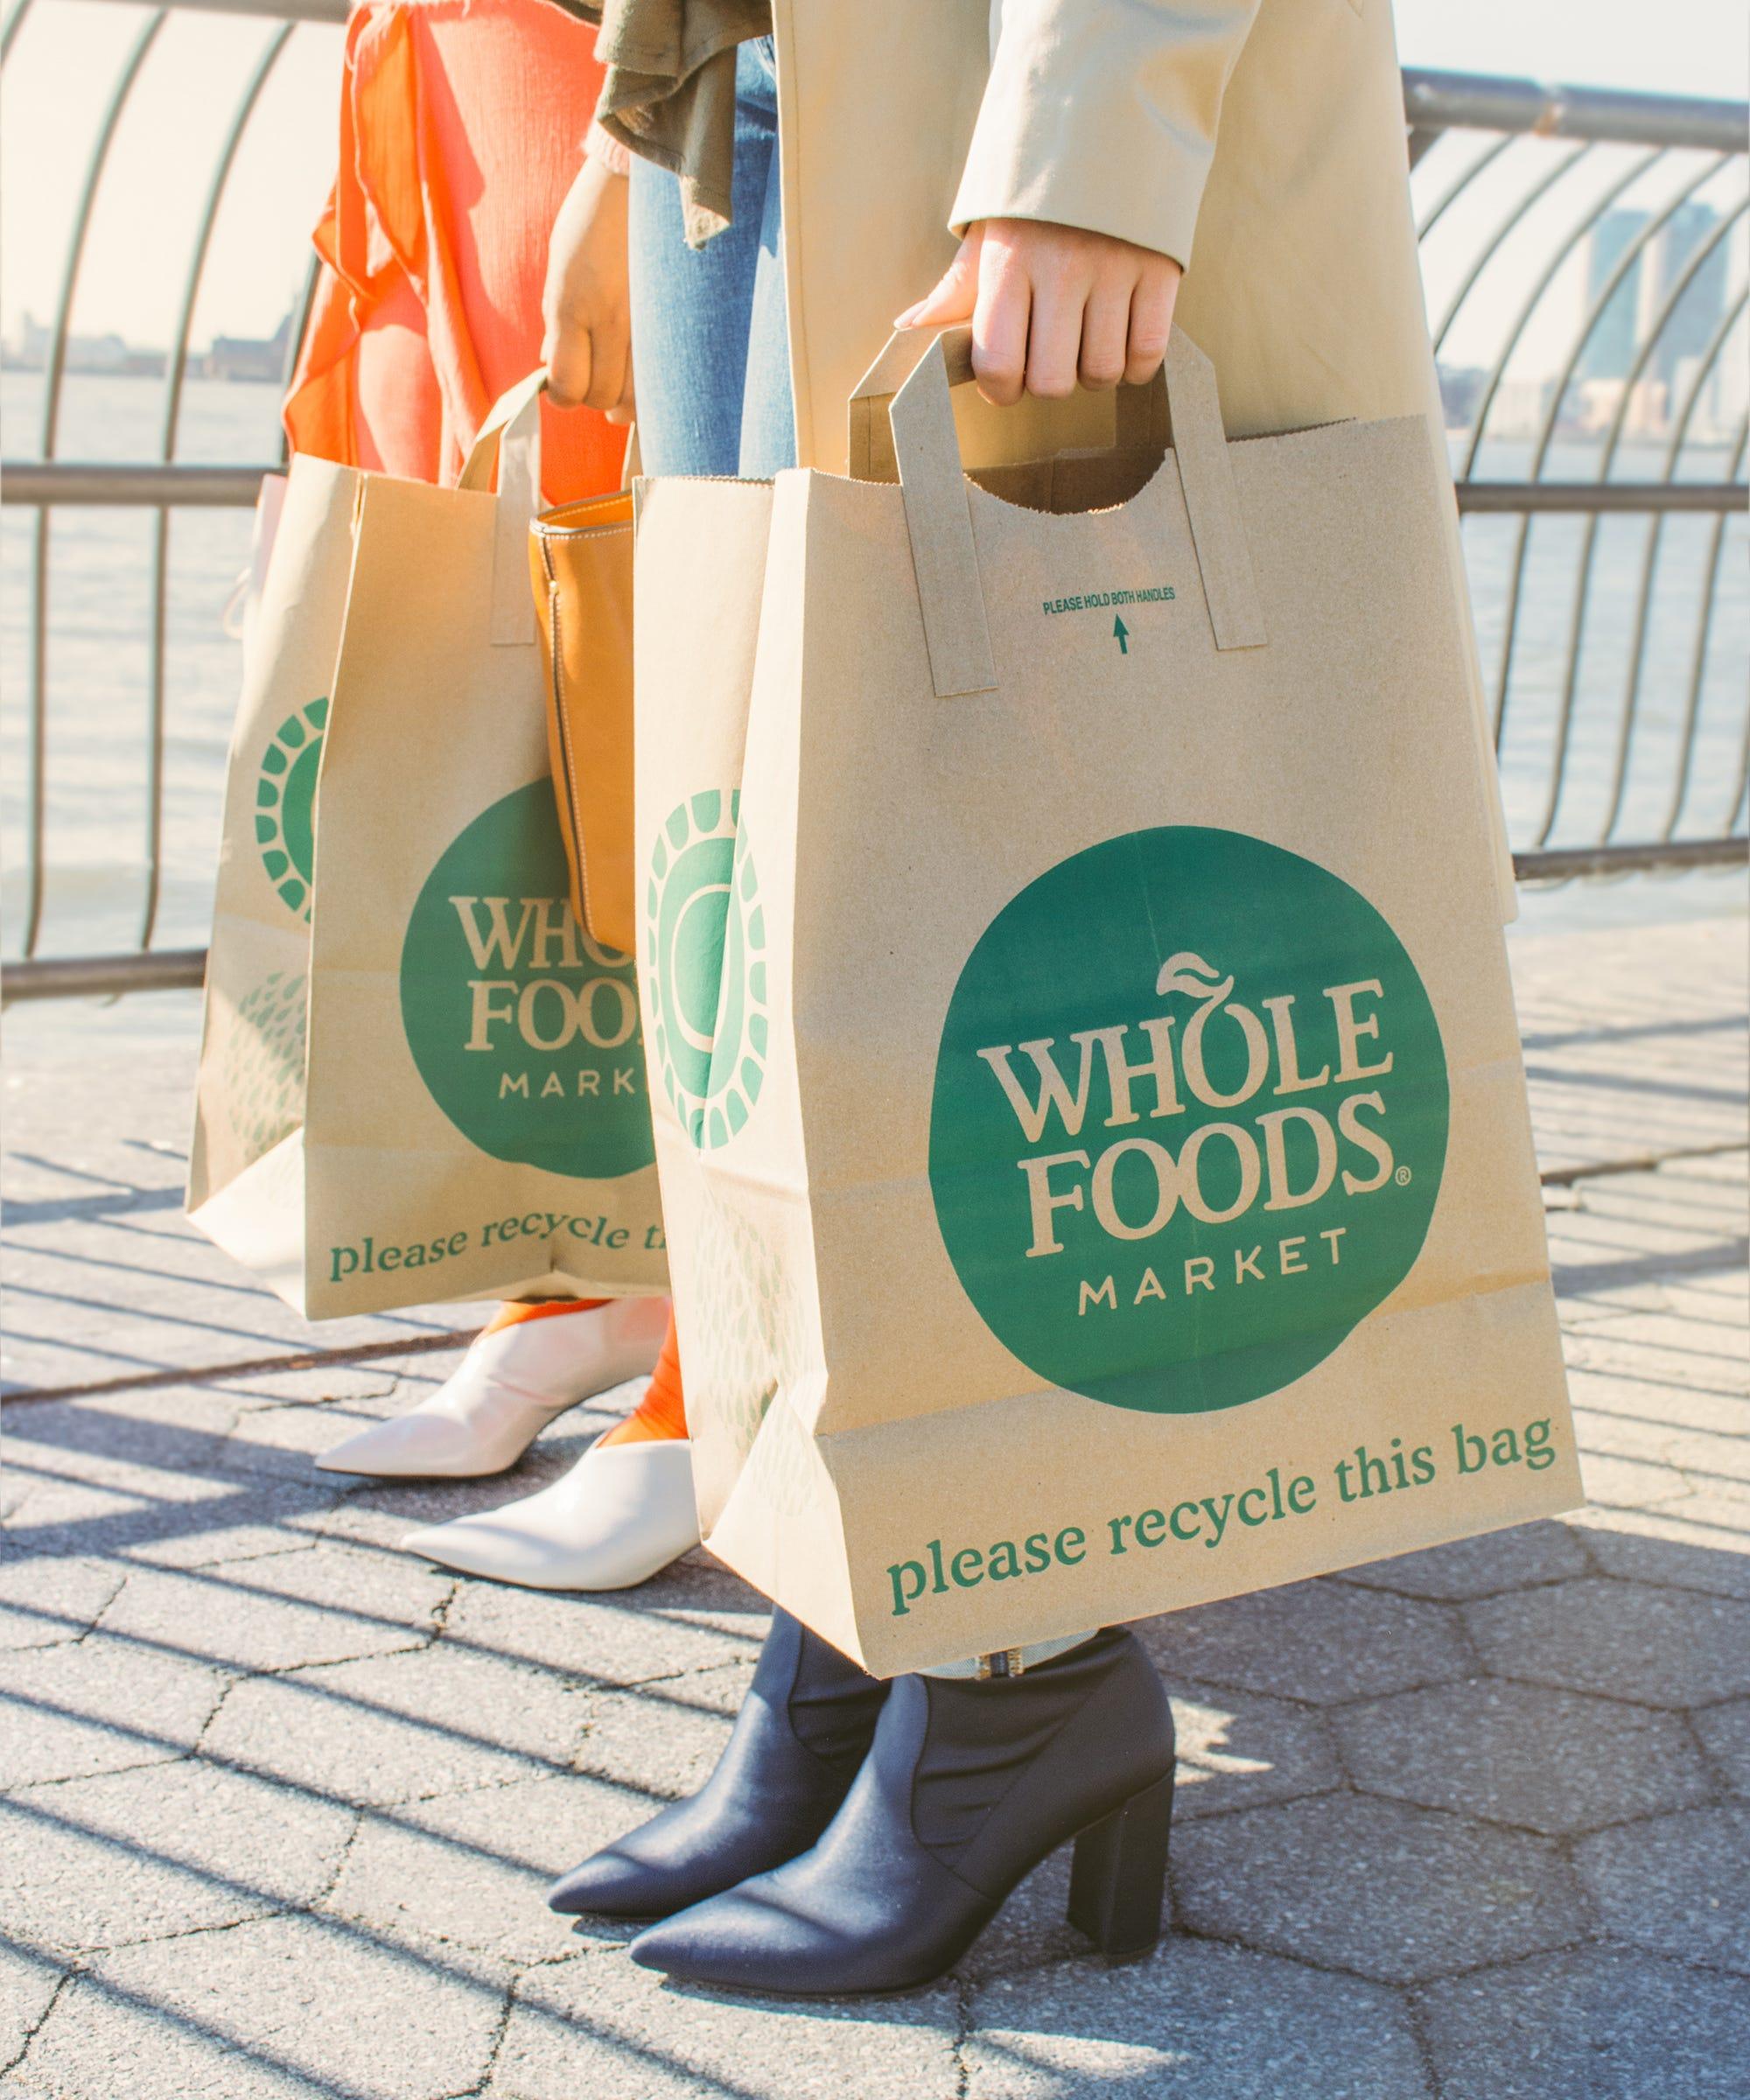 Whole Foods Bans Plastic Straws In Bid